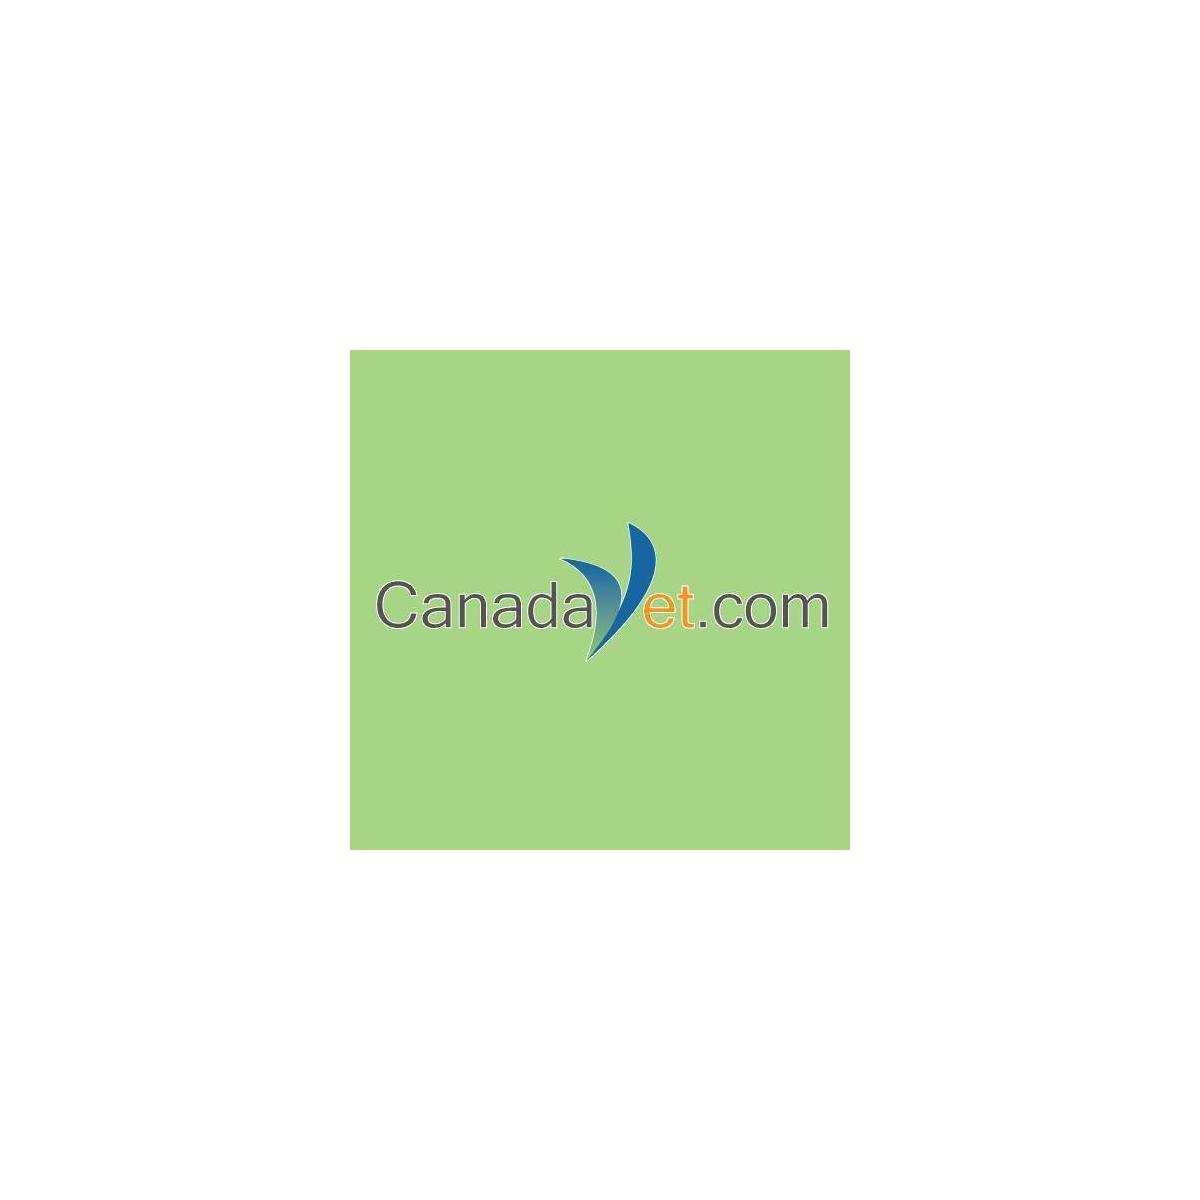 CanadaVet